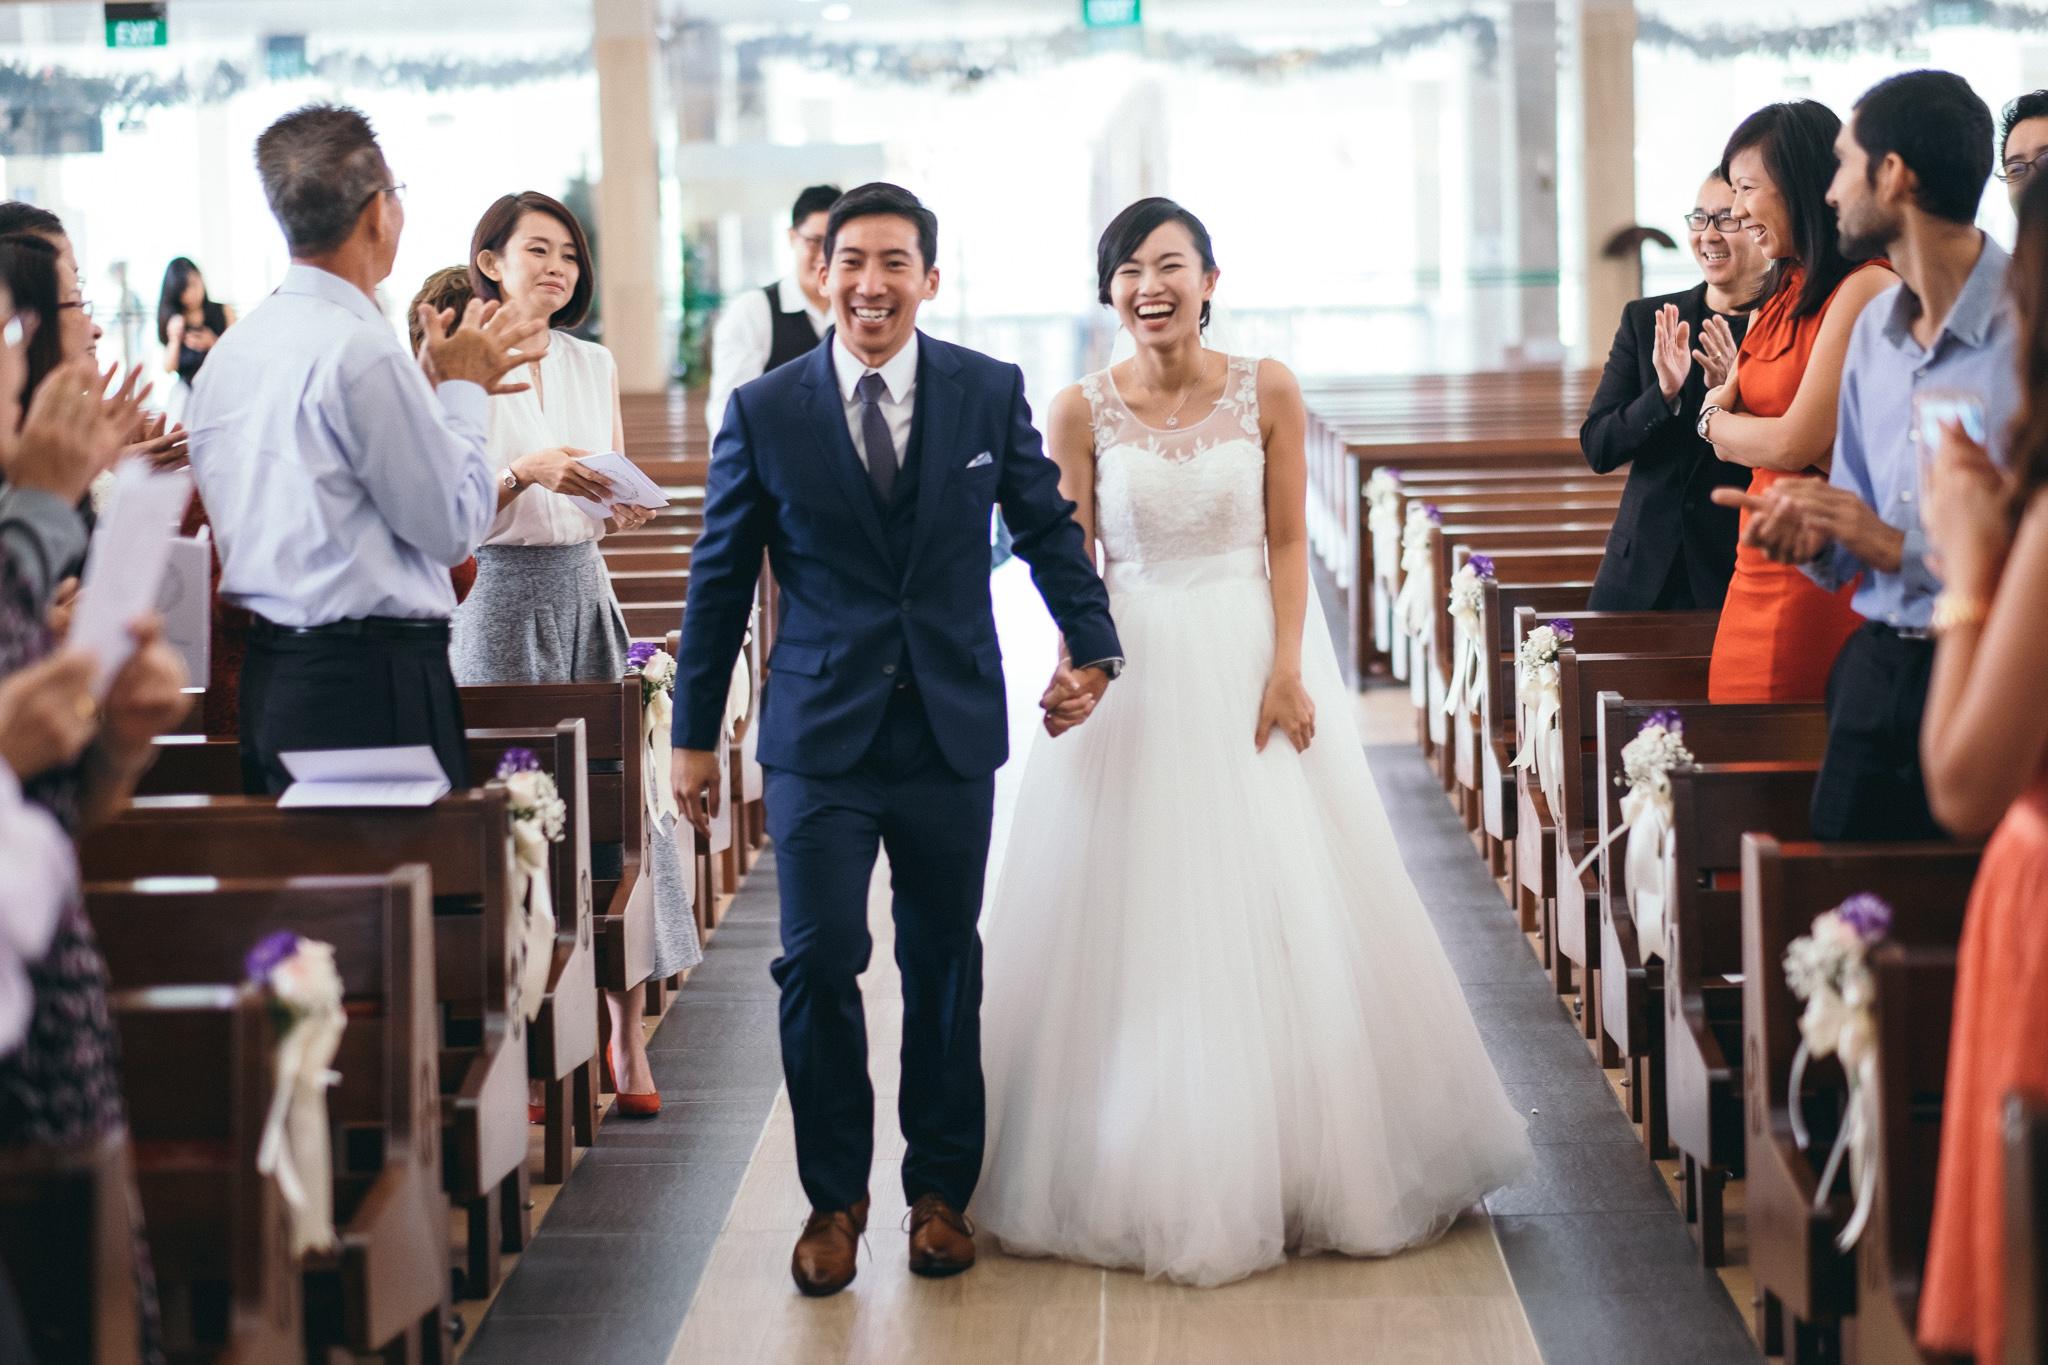 Juxtapose Pix - Wedding - Kelvin & Serene - church regent hotel 00033.jpg